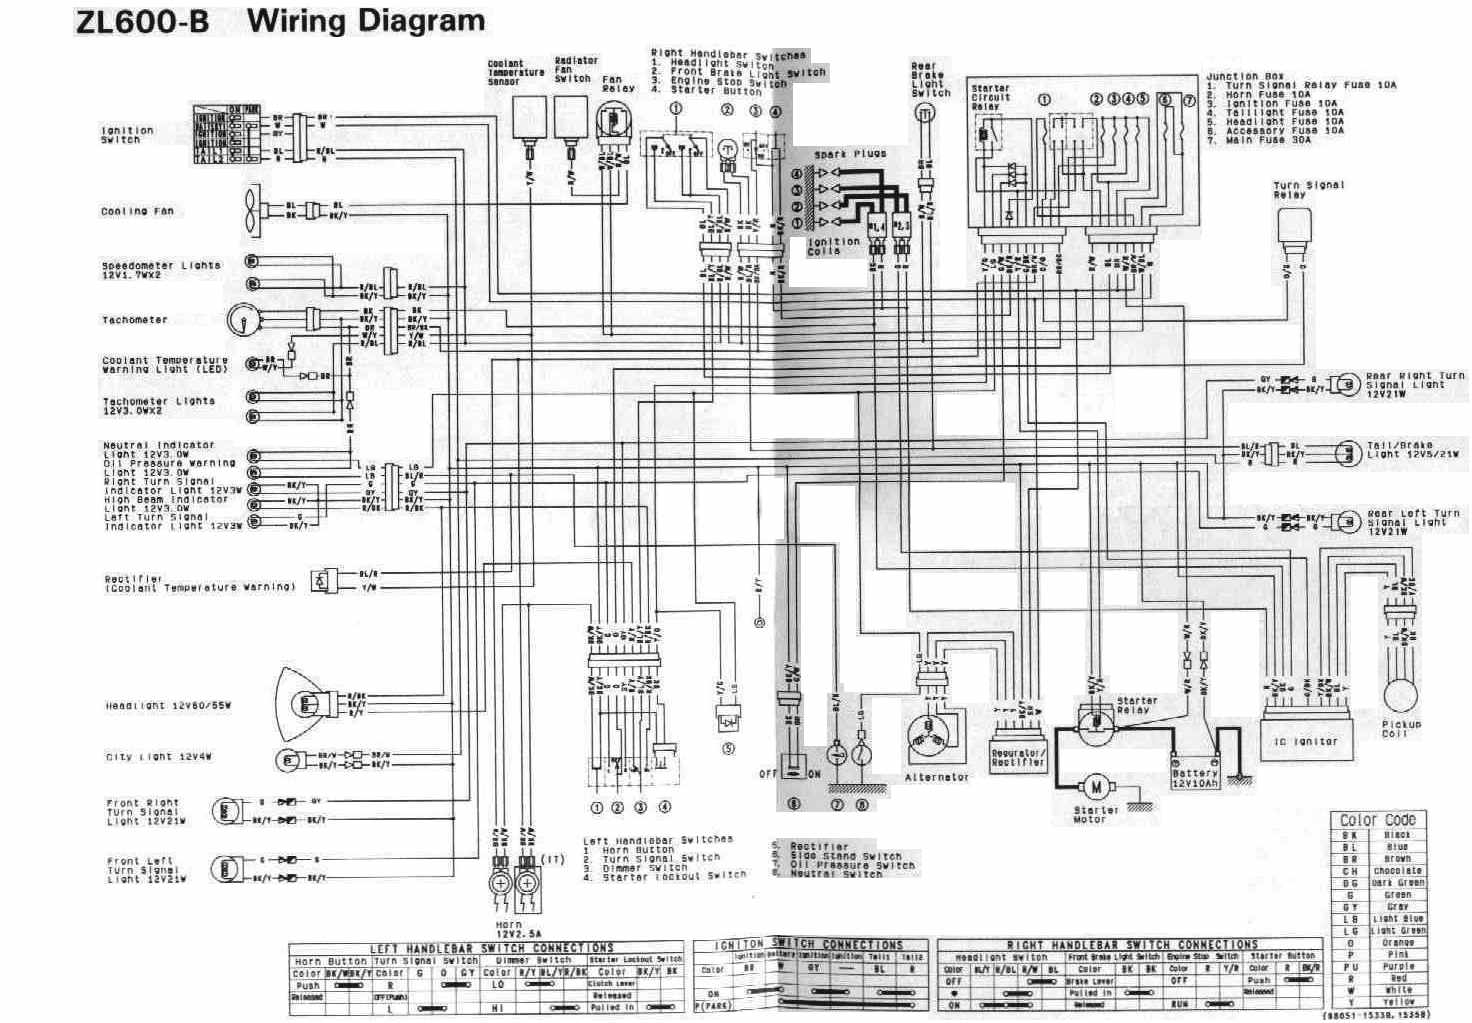 Modern Block Diagram Ic Tcl A30v04 To Photo - Wiring Diagram Ideas ...